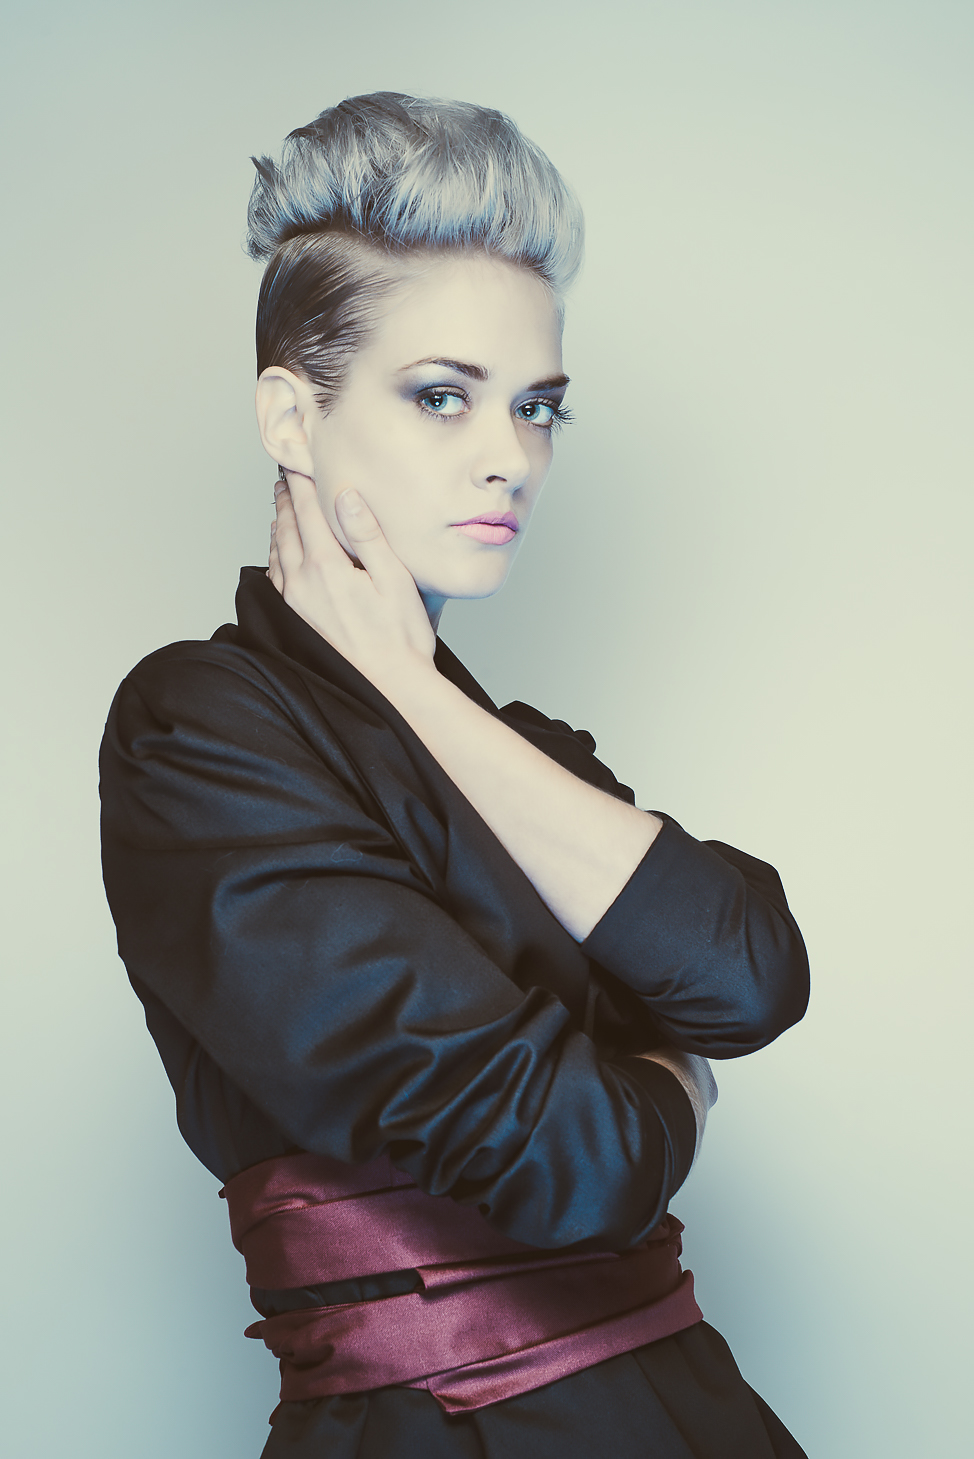 zaramia-ava-zaramiaava-leeds-fashion-designer-ethical-sustainable-tailored-minimalist-mio-black-jacket-top-red-belt-versatile-drape-cowl-styling-menswear-models-photoshoot-shrine-hairdressers-40